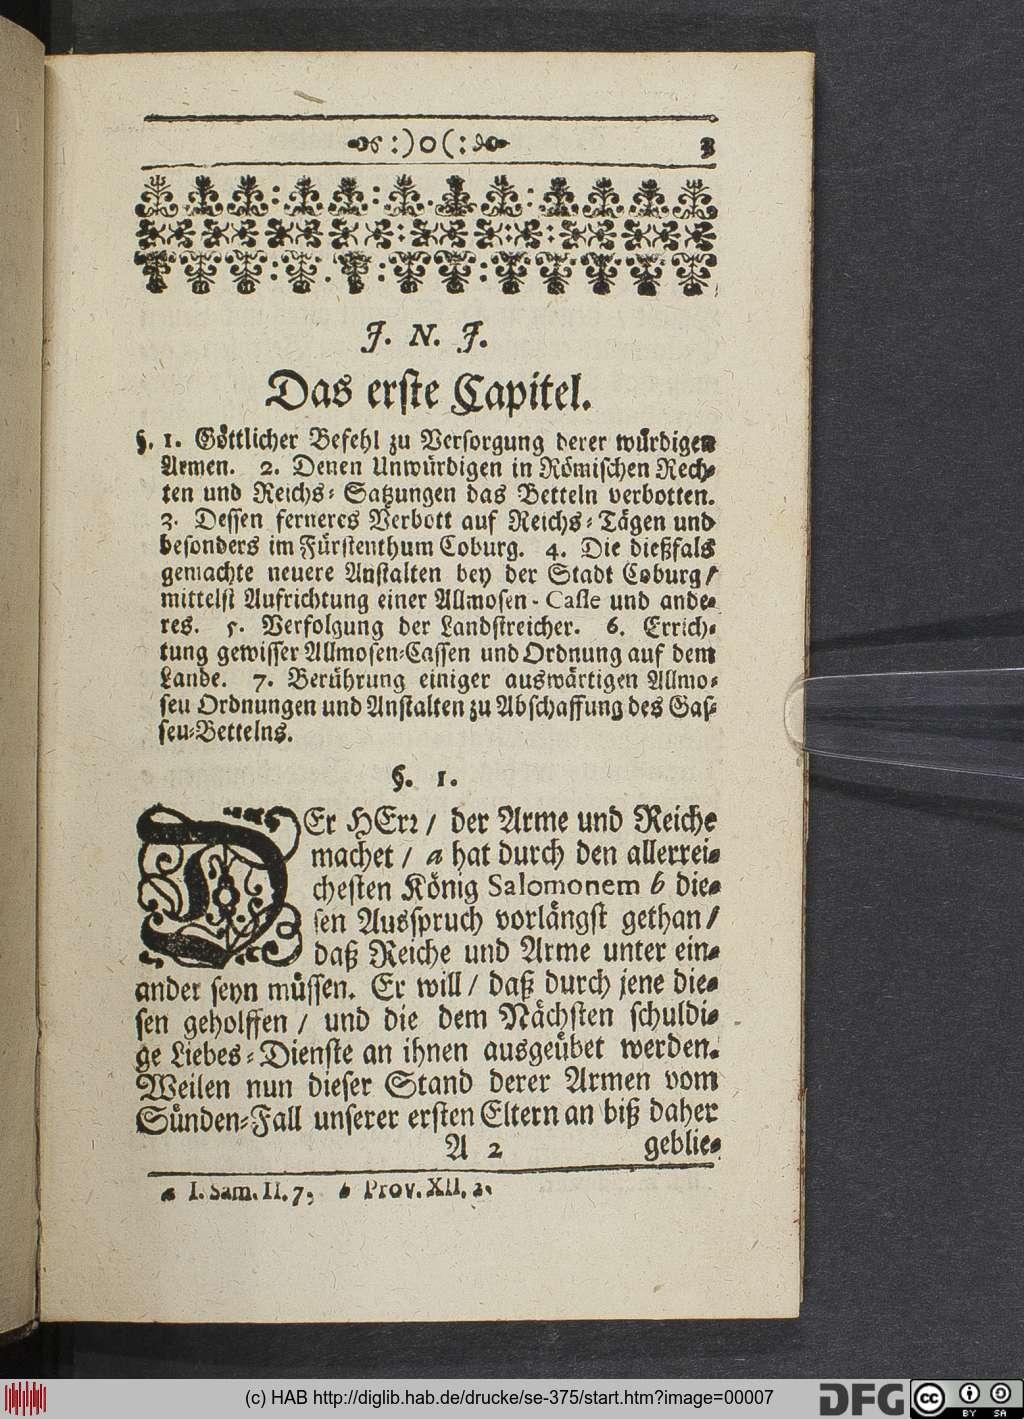 http://diglib.hab.de/drucke/se-375/00007.jpg